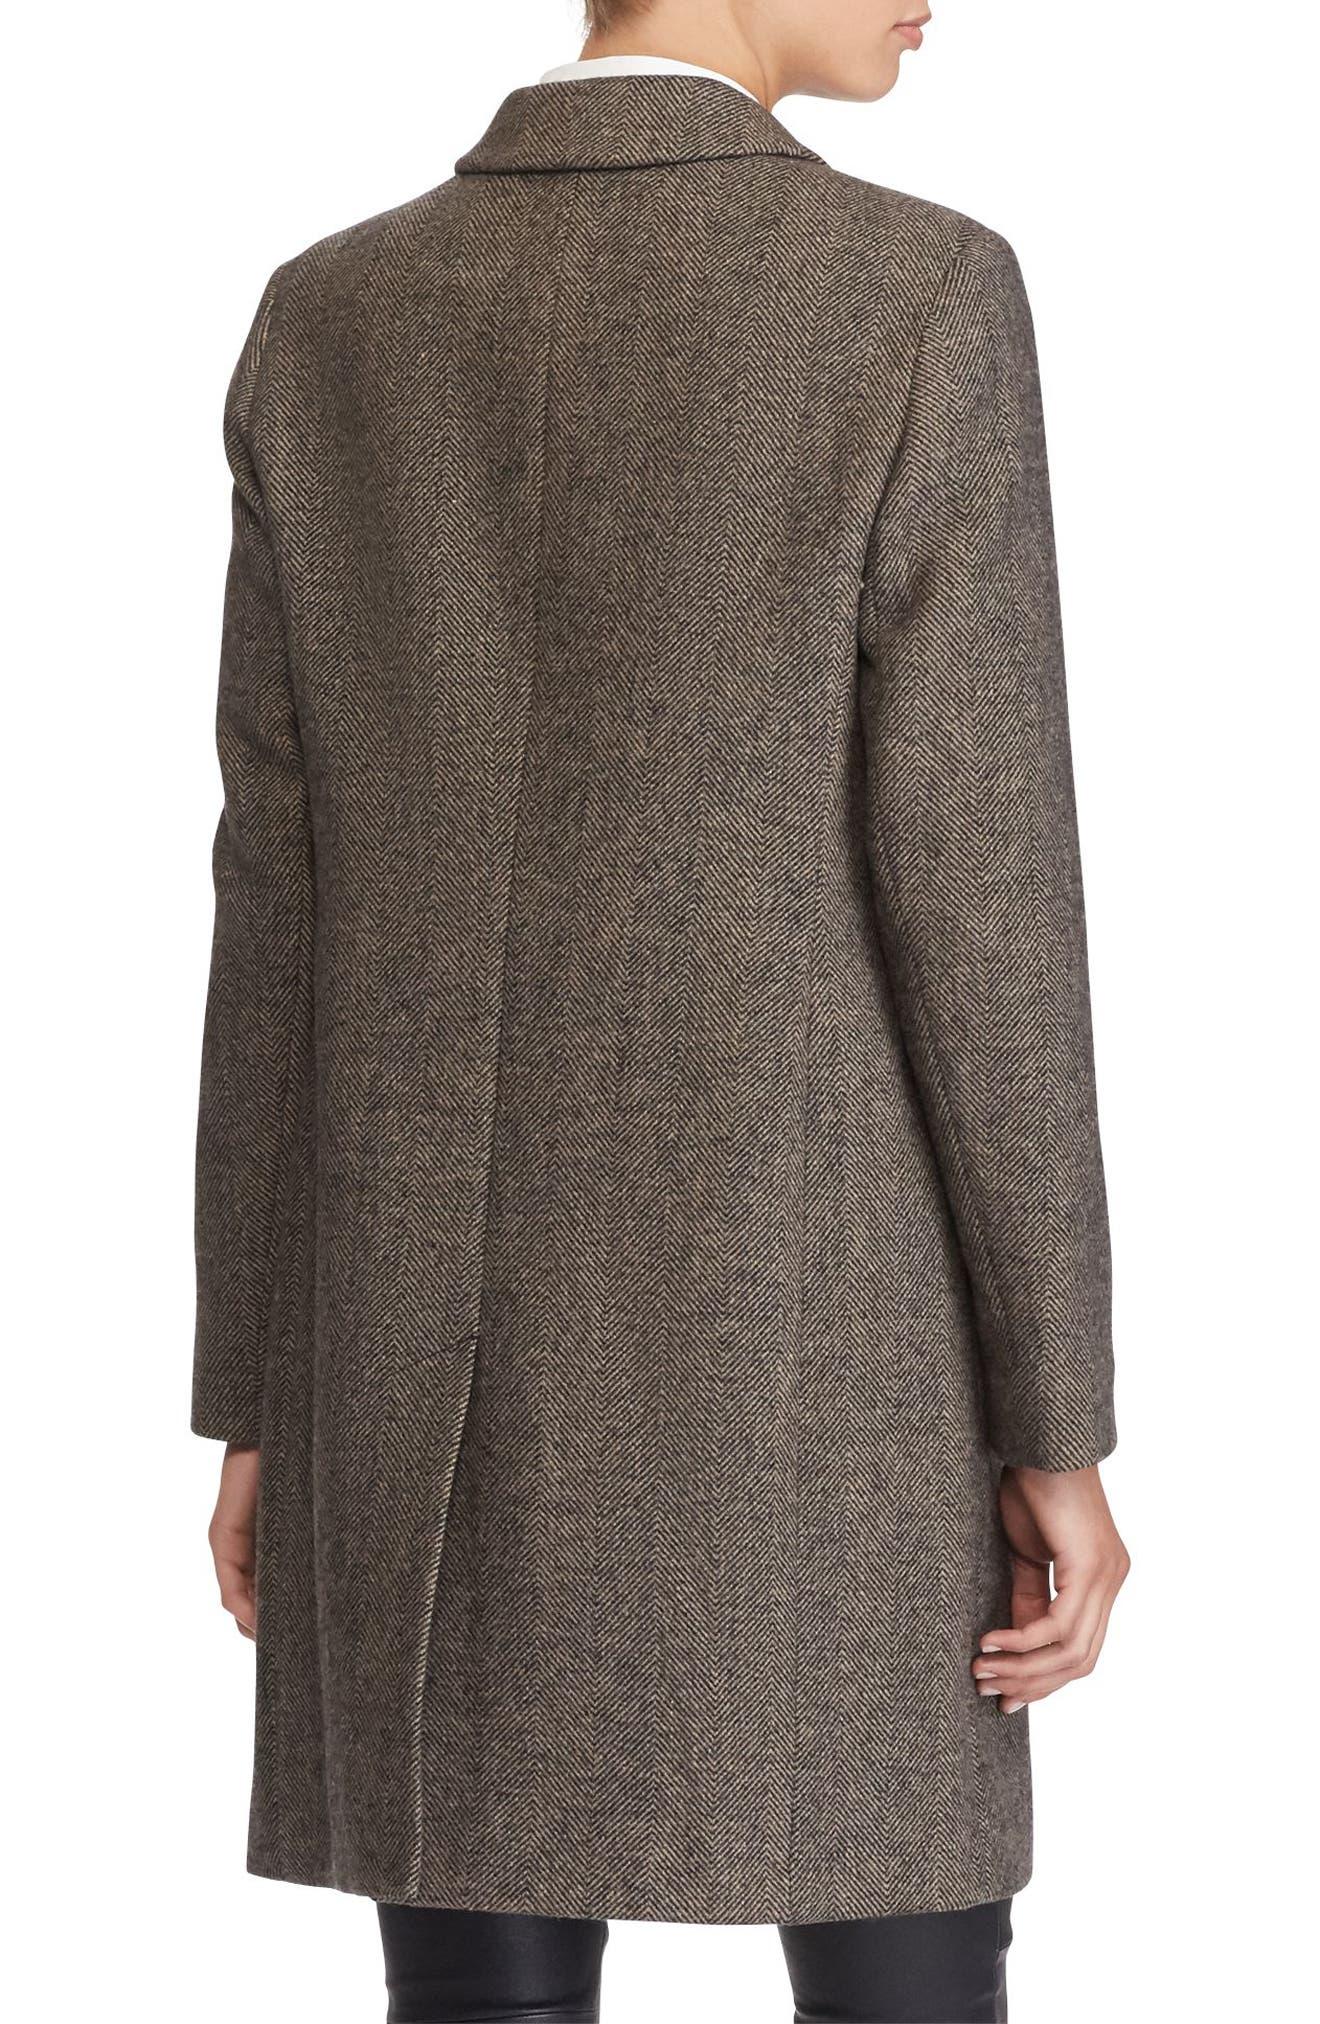 Wool Blend Reefer Coat,                             Alternate thumbnail 22, color,